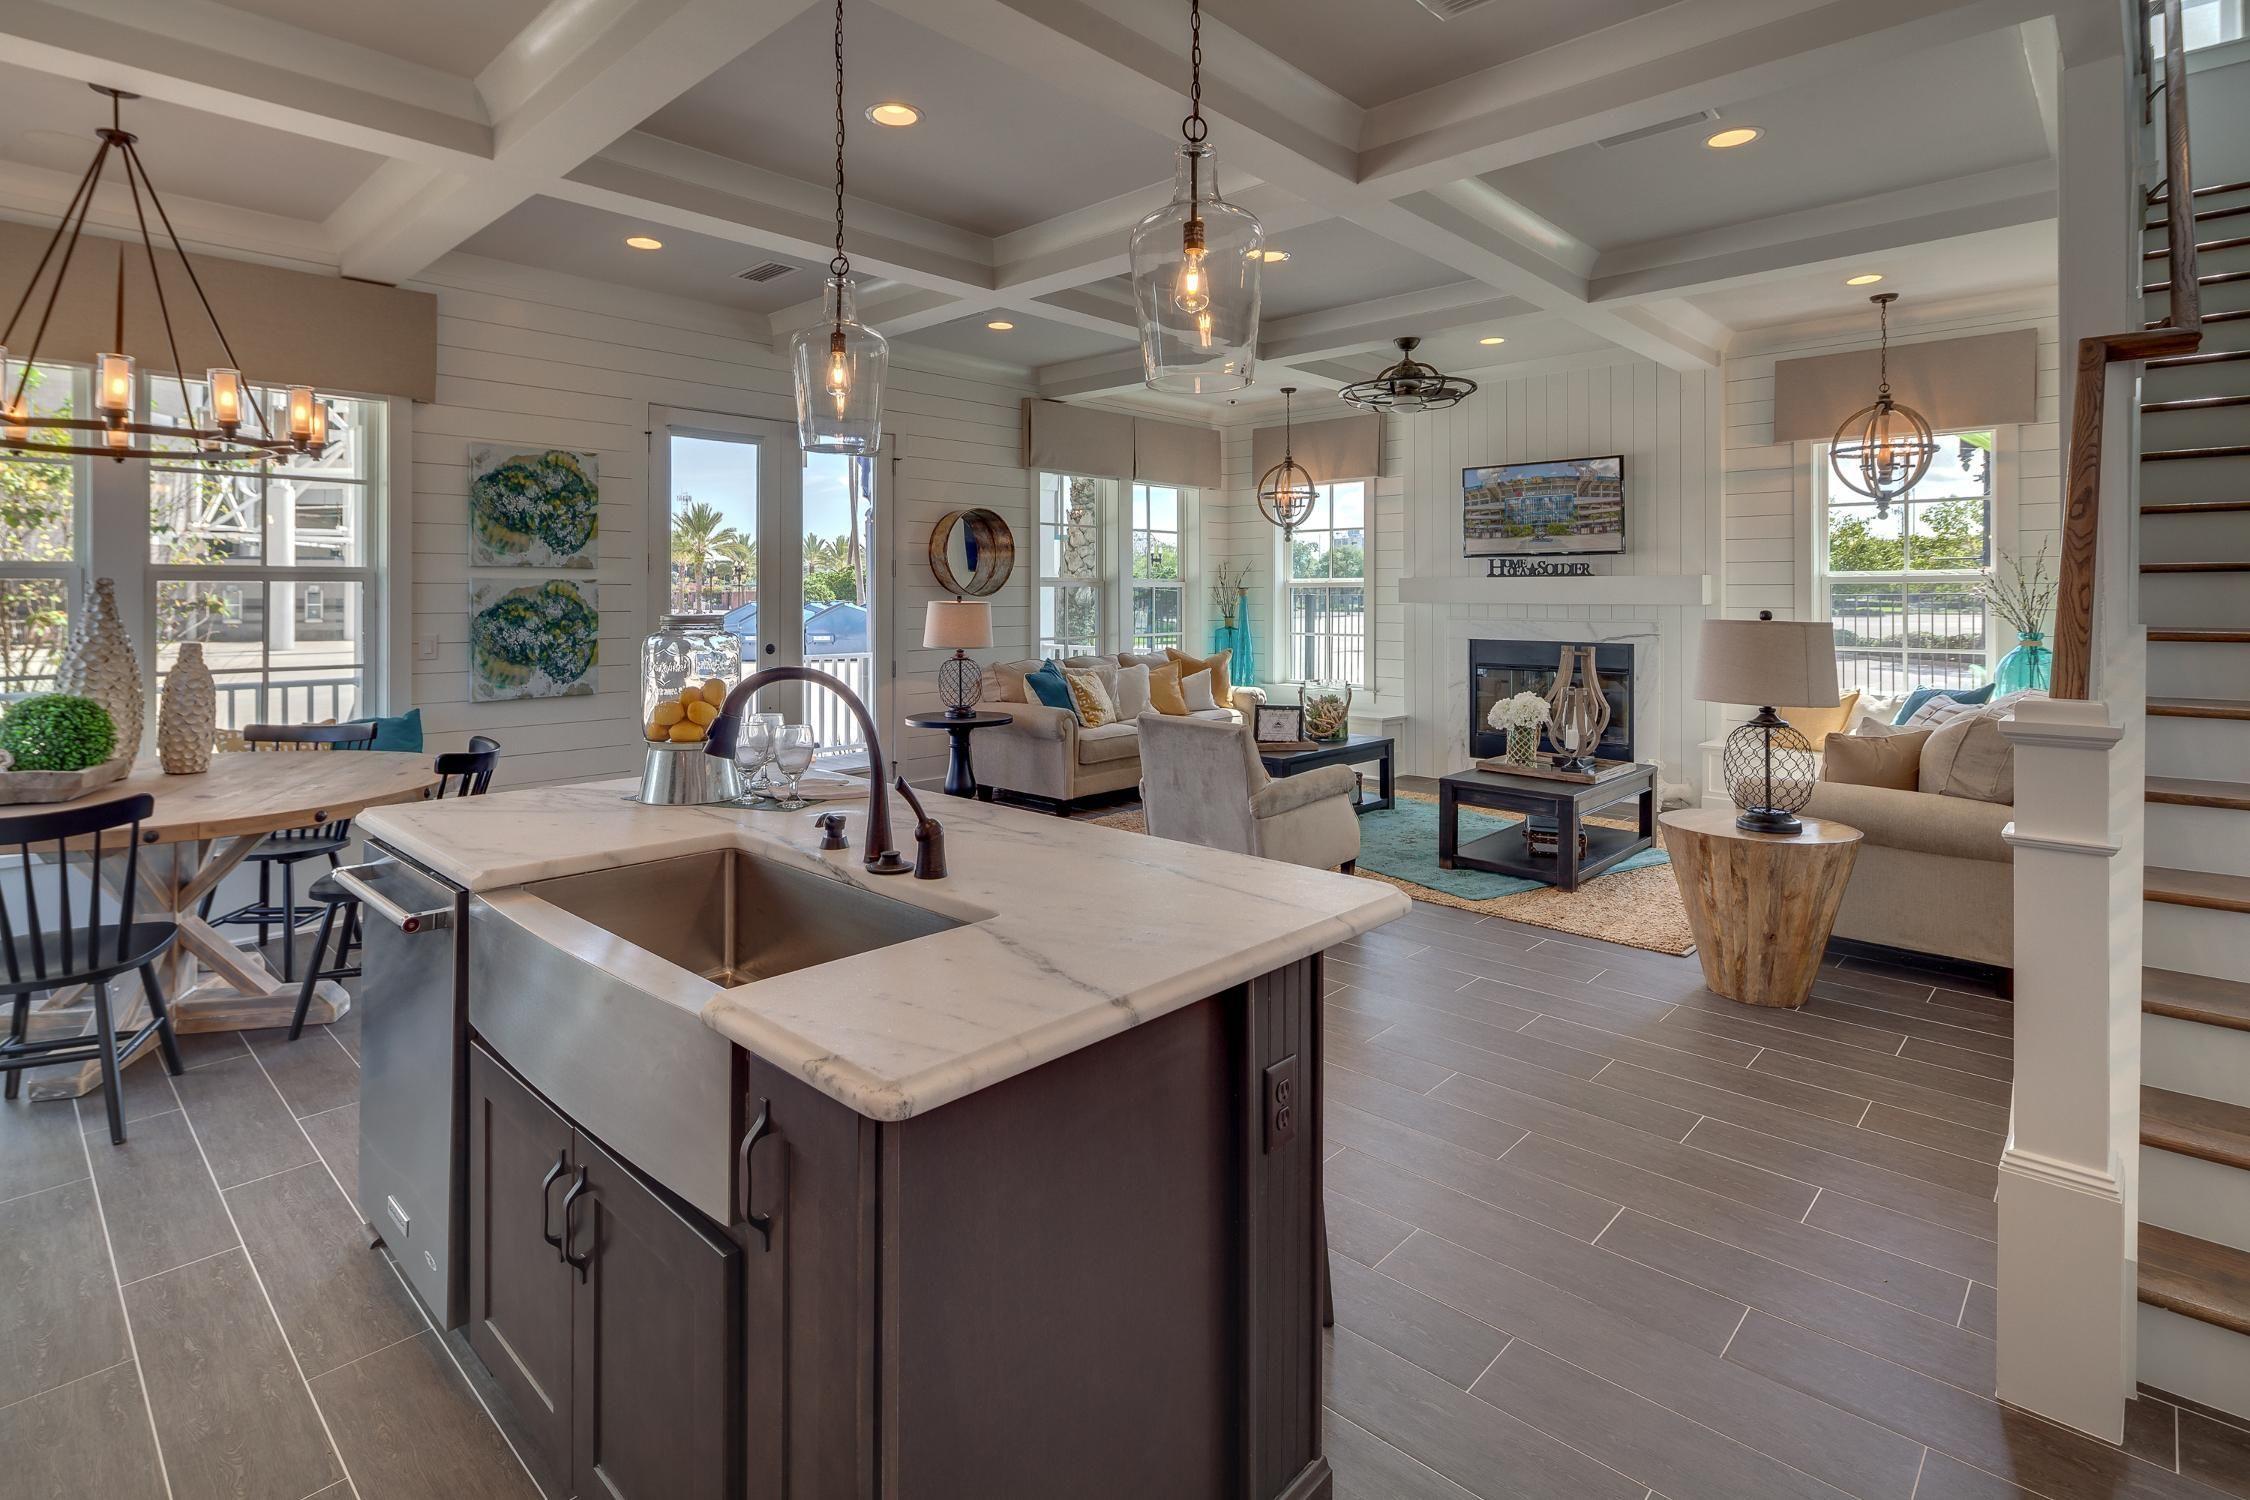 Kitchen Model Homes dreamfindershomes.kitchenview3 | rustic coastal chic | pinterest